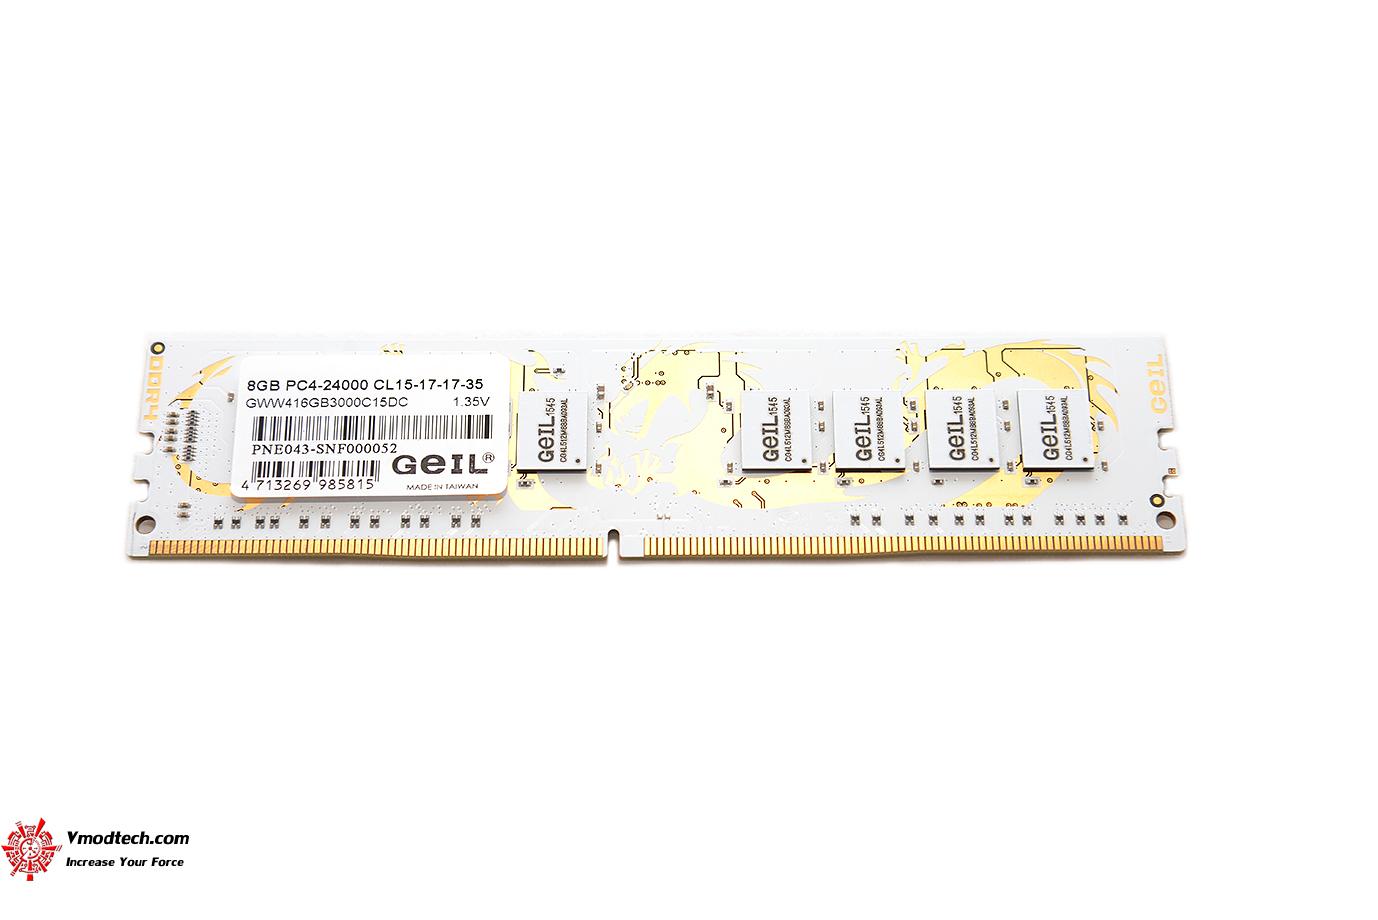 dsc 3631 GEIL DDR4 Dragon RAM 3000Mhz 16GB REVIEW